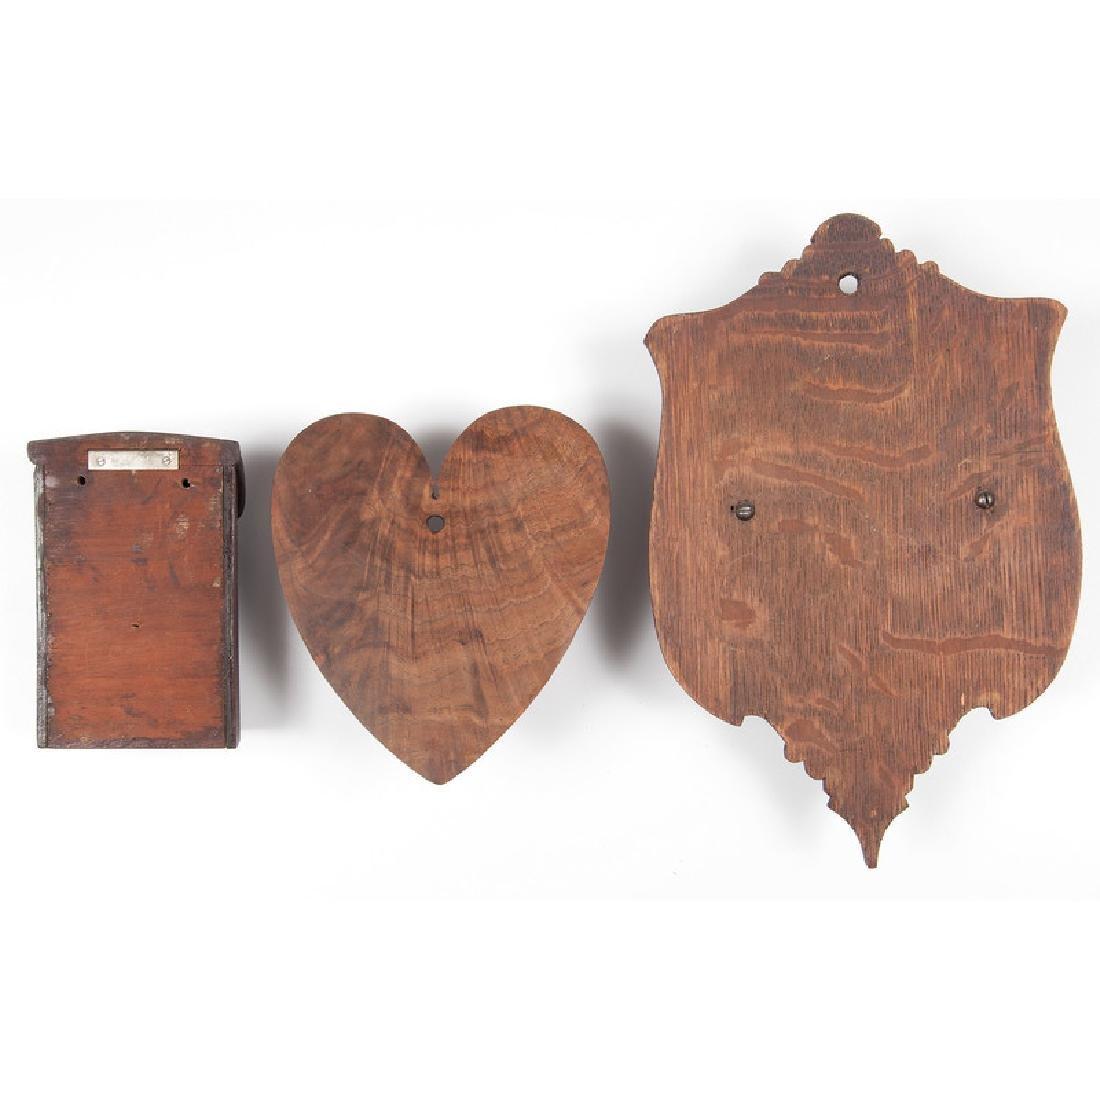 Three Wooden Match Holders - 2